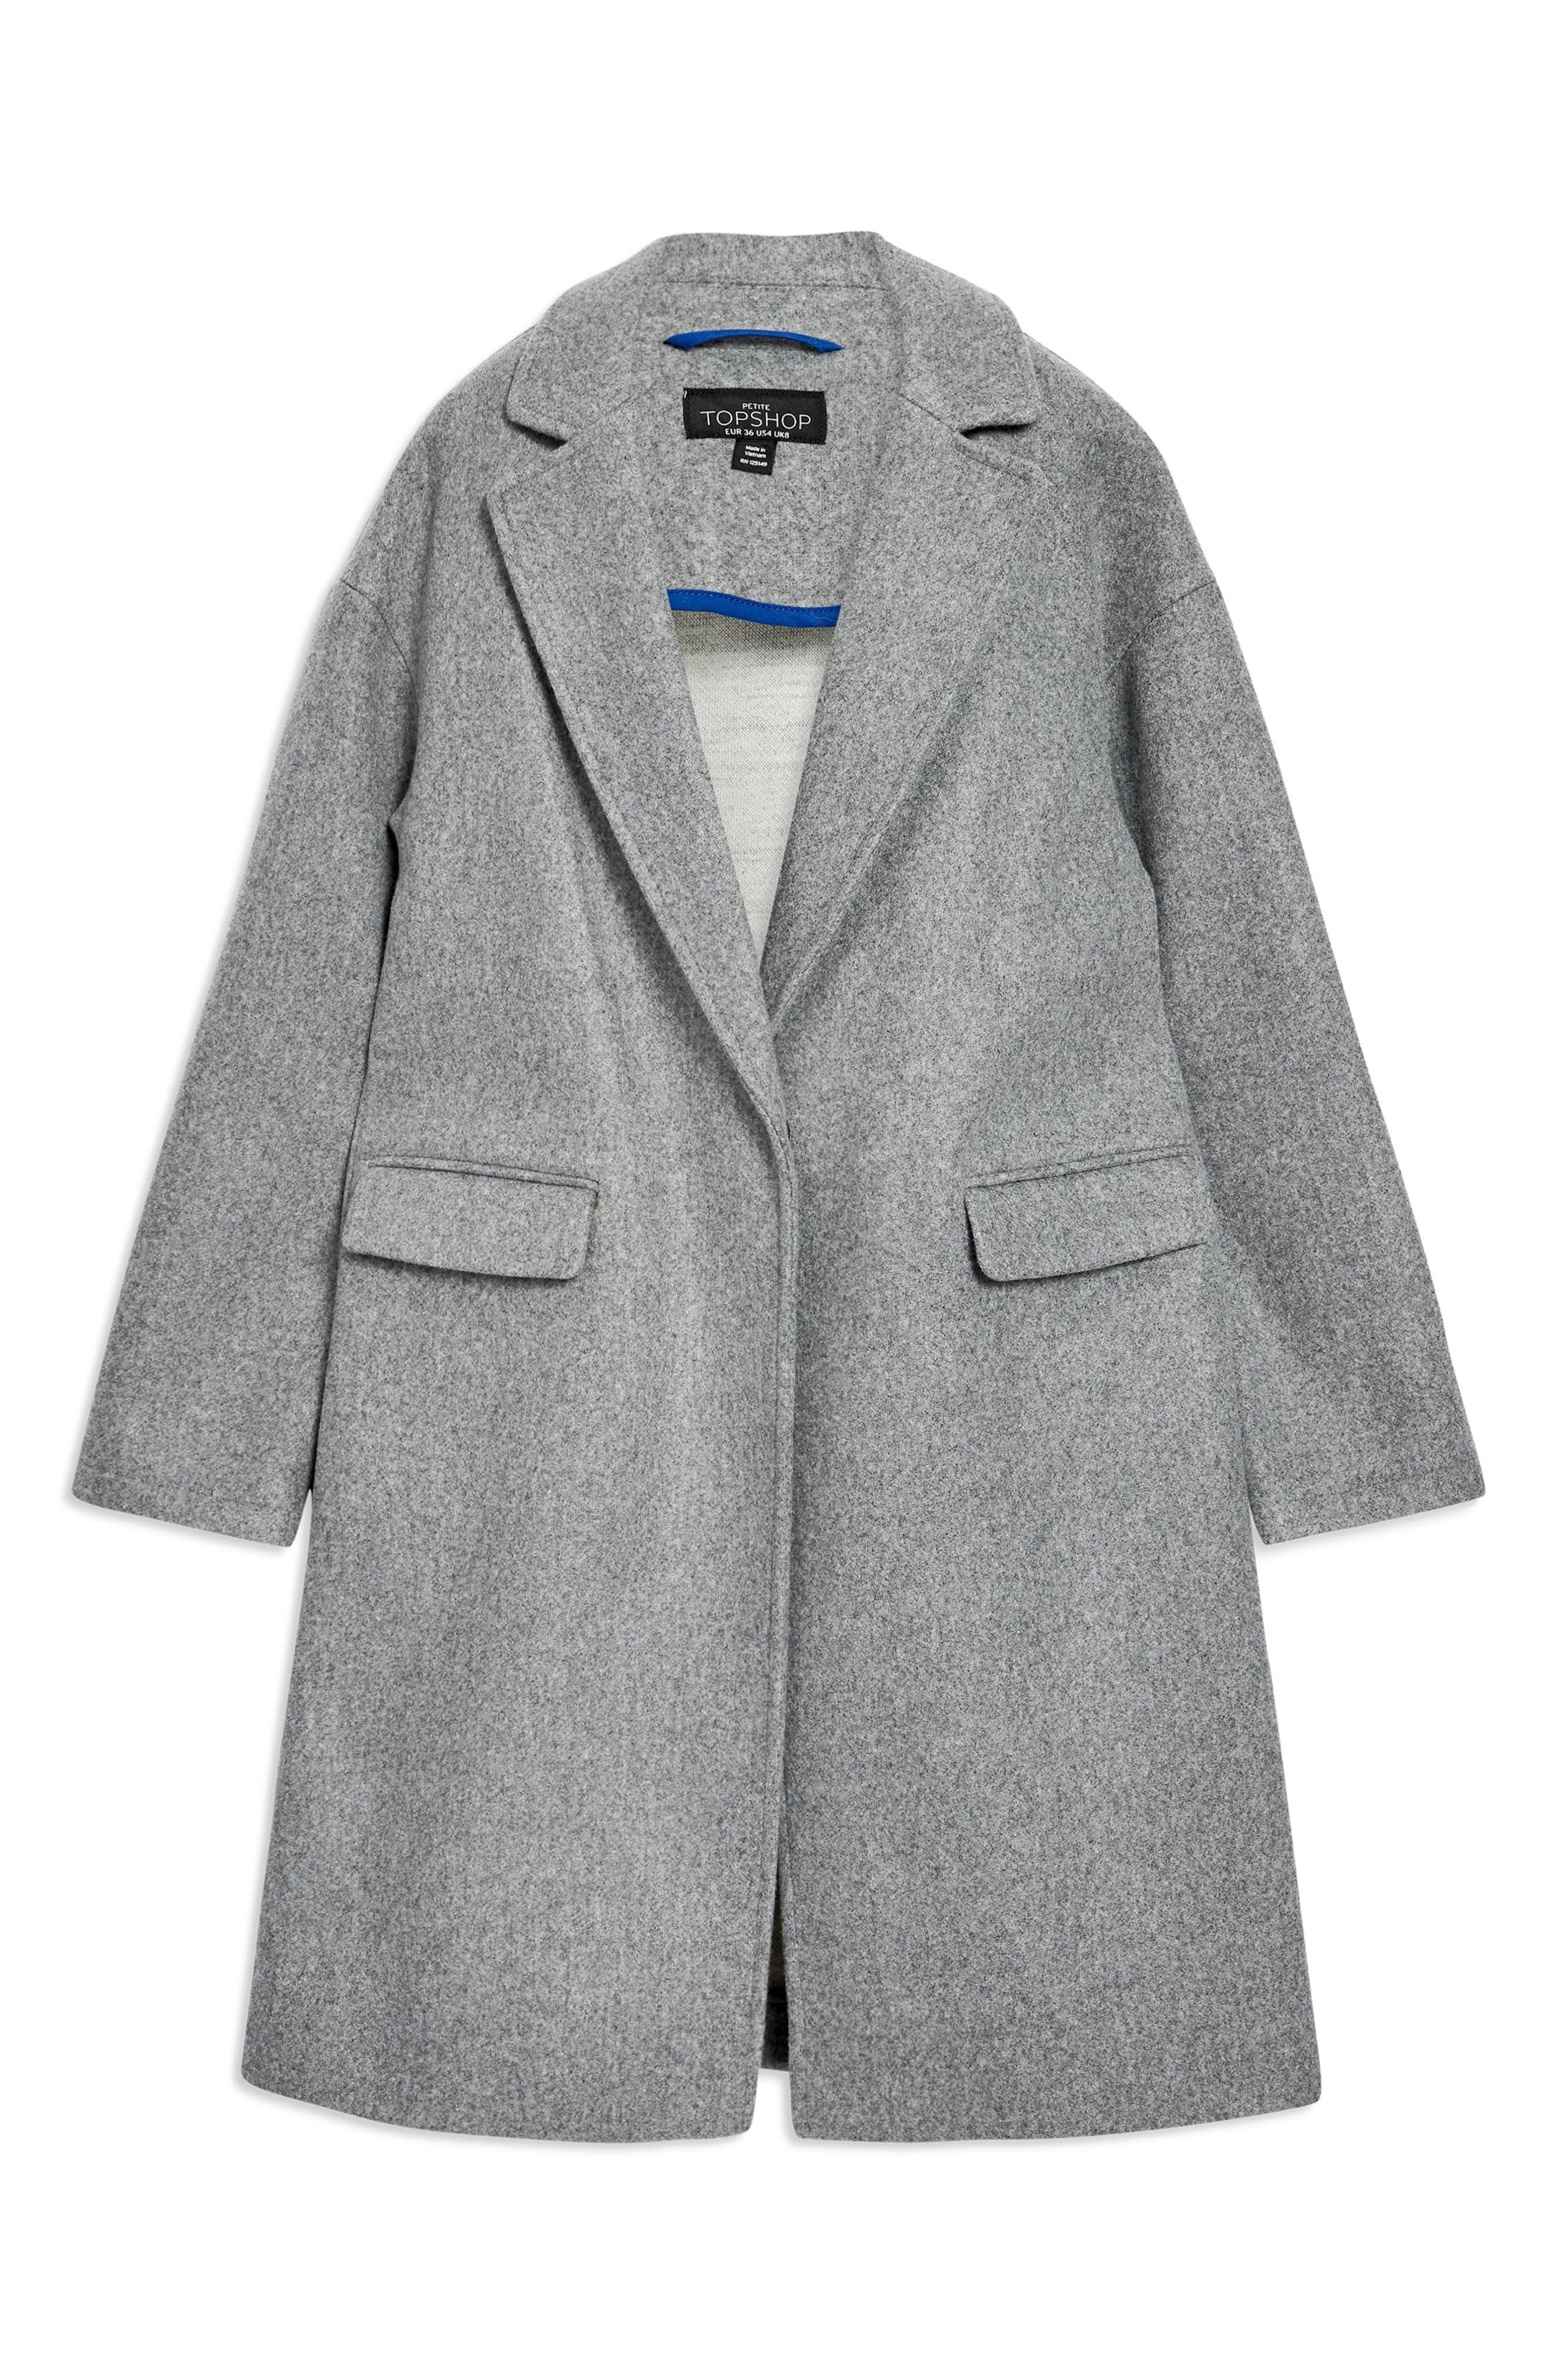 Lily Knit Back Midi Coat,                             Alternate thumbnail 4, color,                             GREY MARL